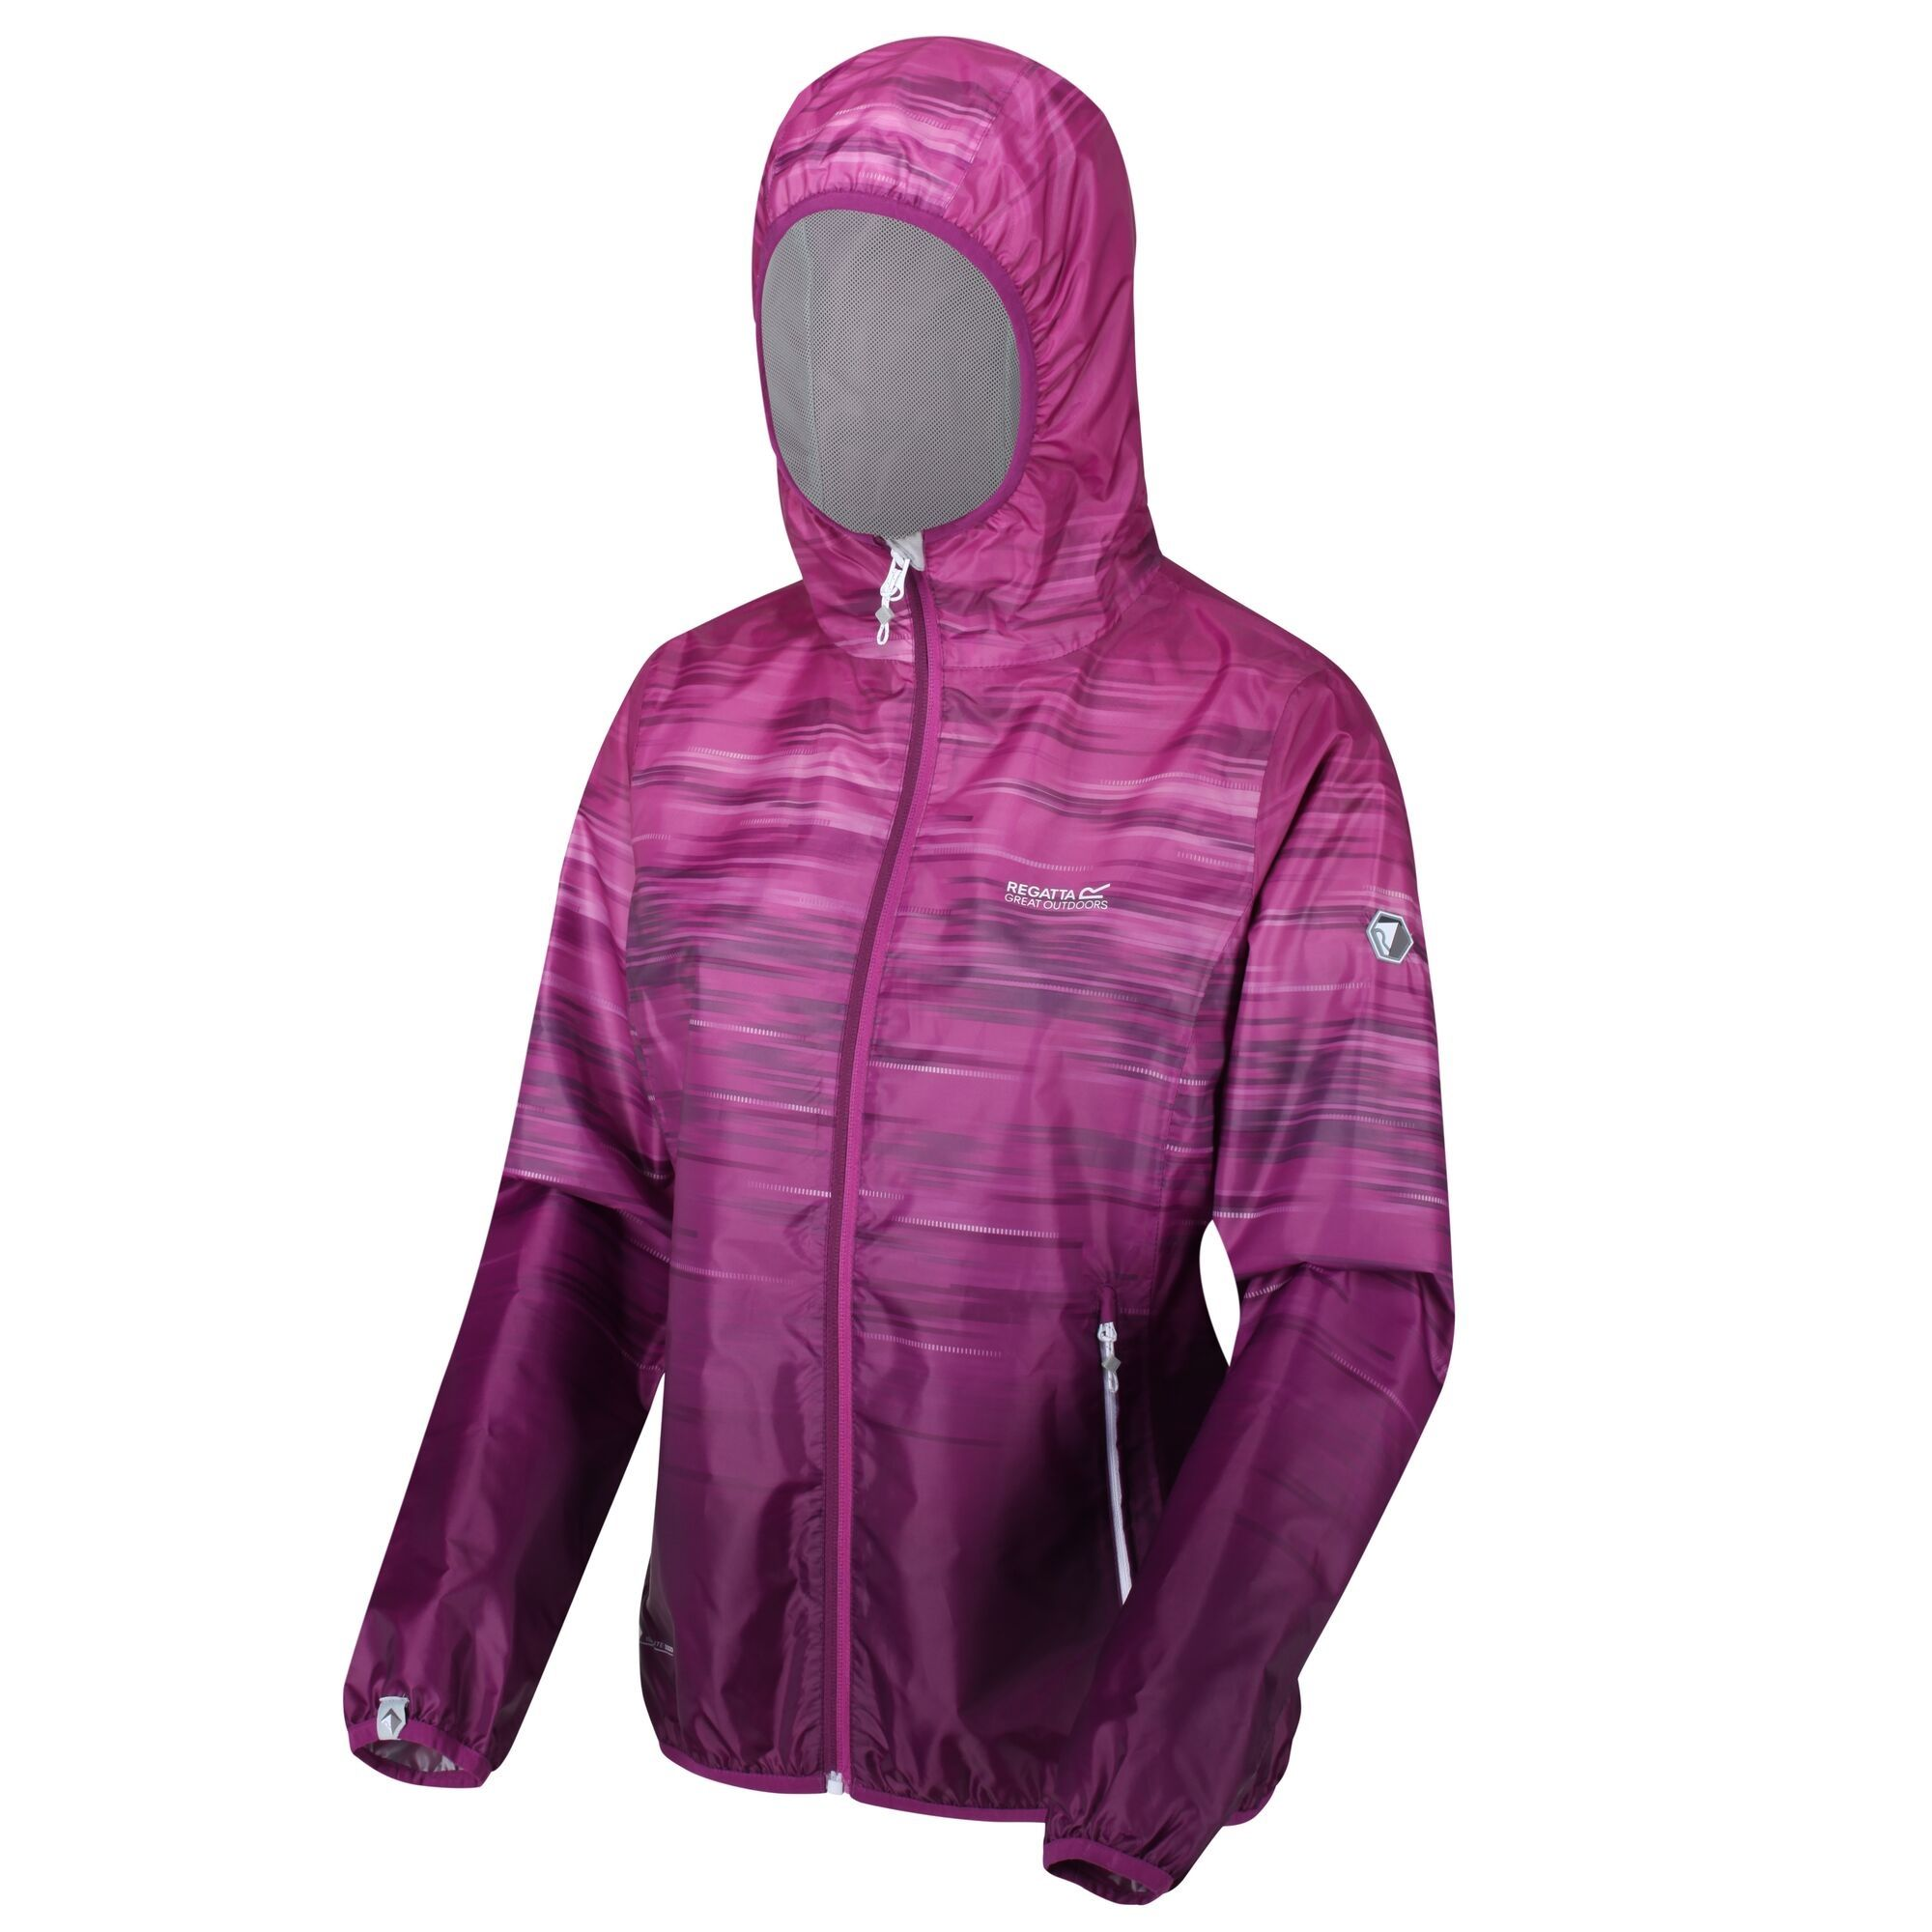 Regatta Womens/Ladies Leera IV Lightweight Waterproof Jacket